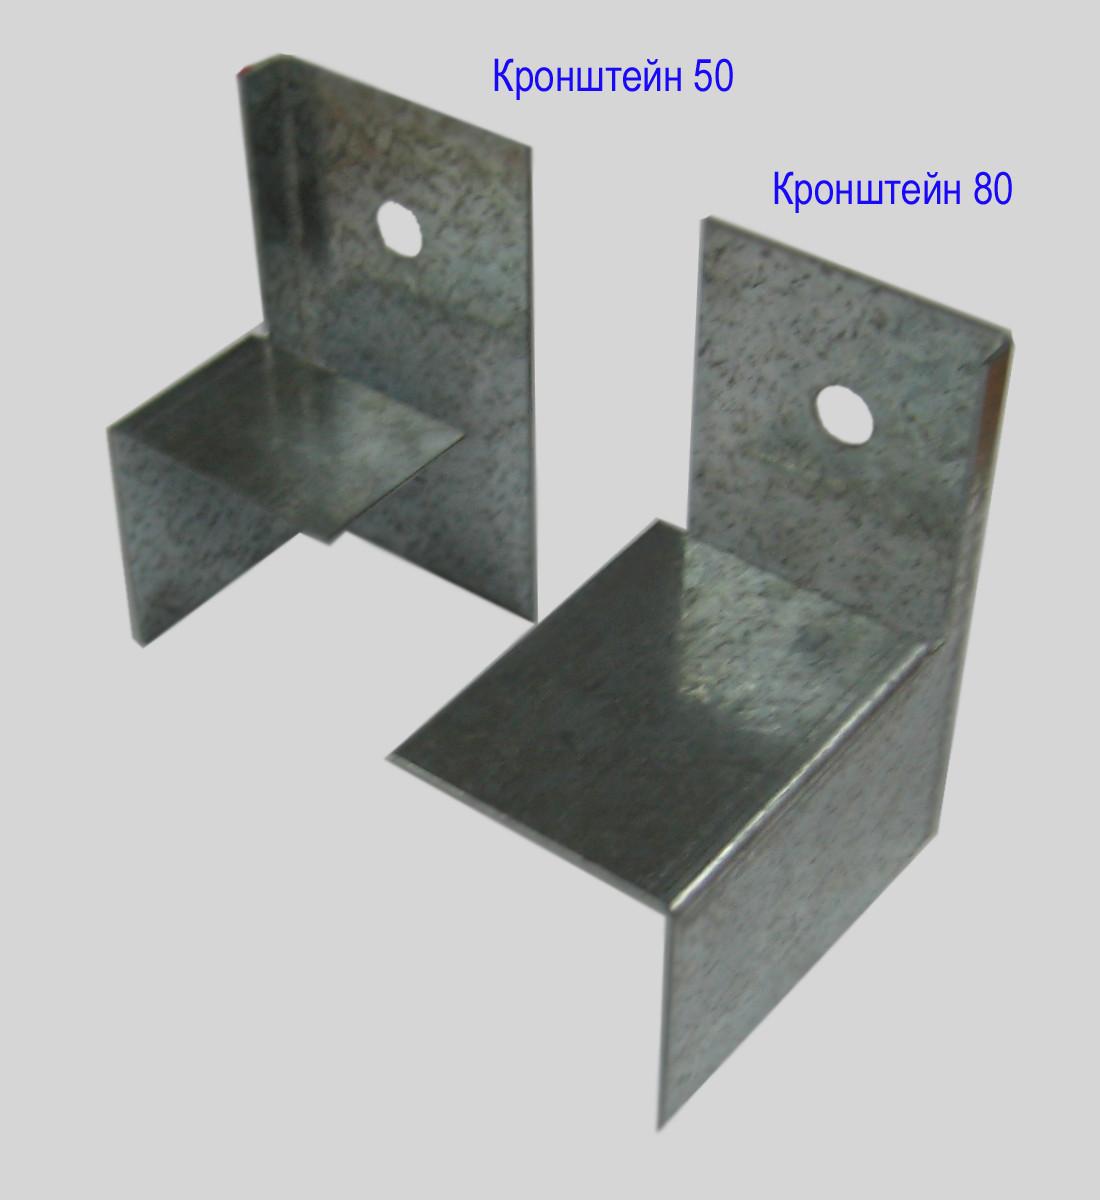 Кронштейн оцинкованный КР-50, тол. 1,4 мм